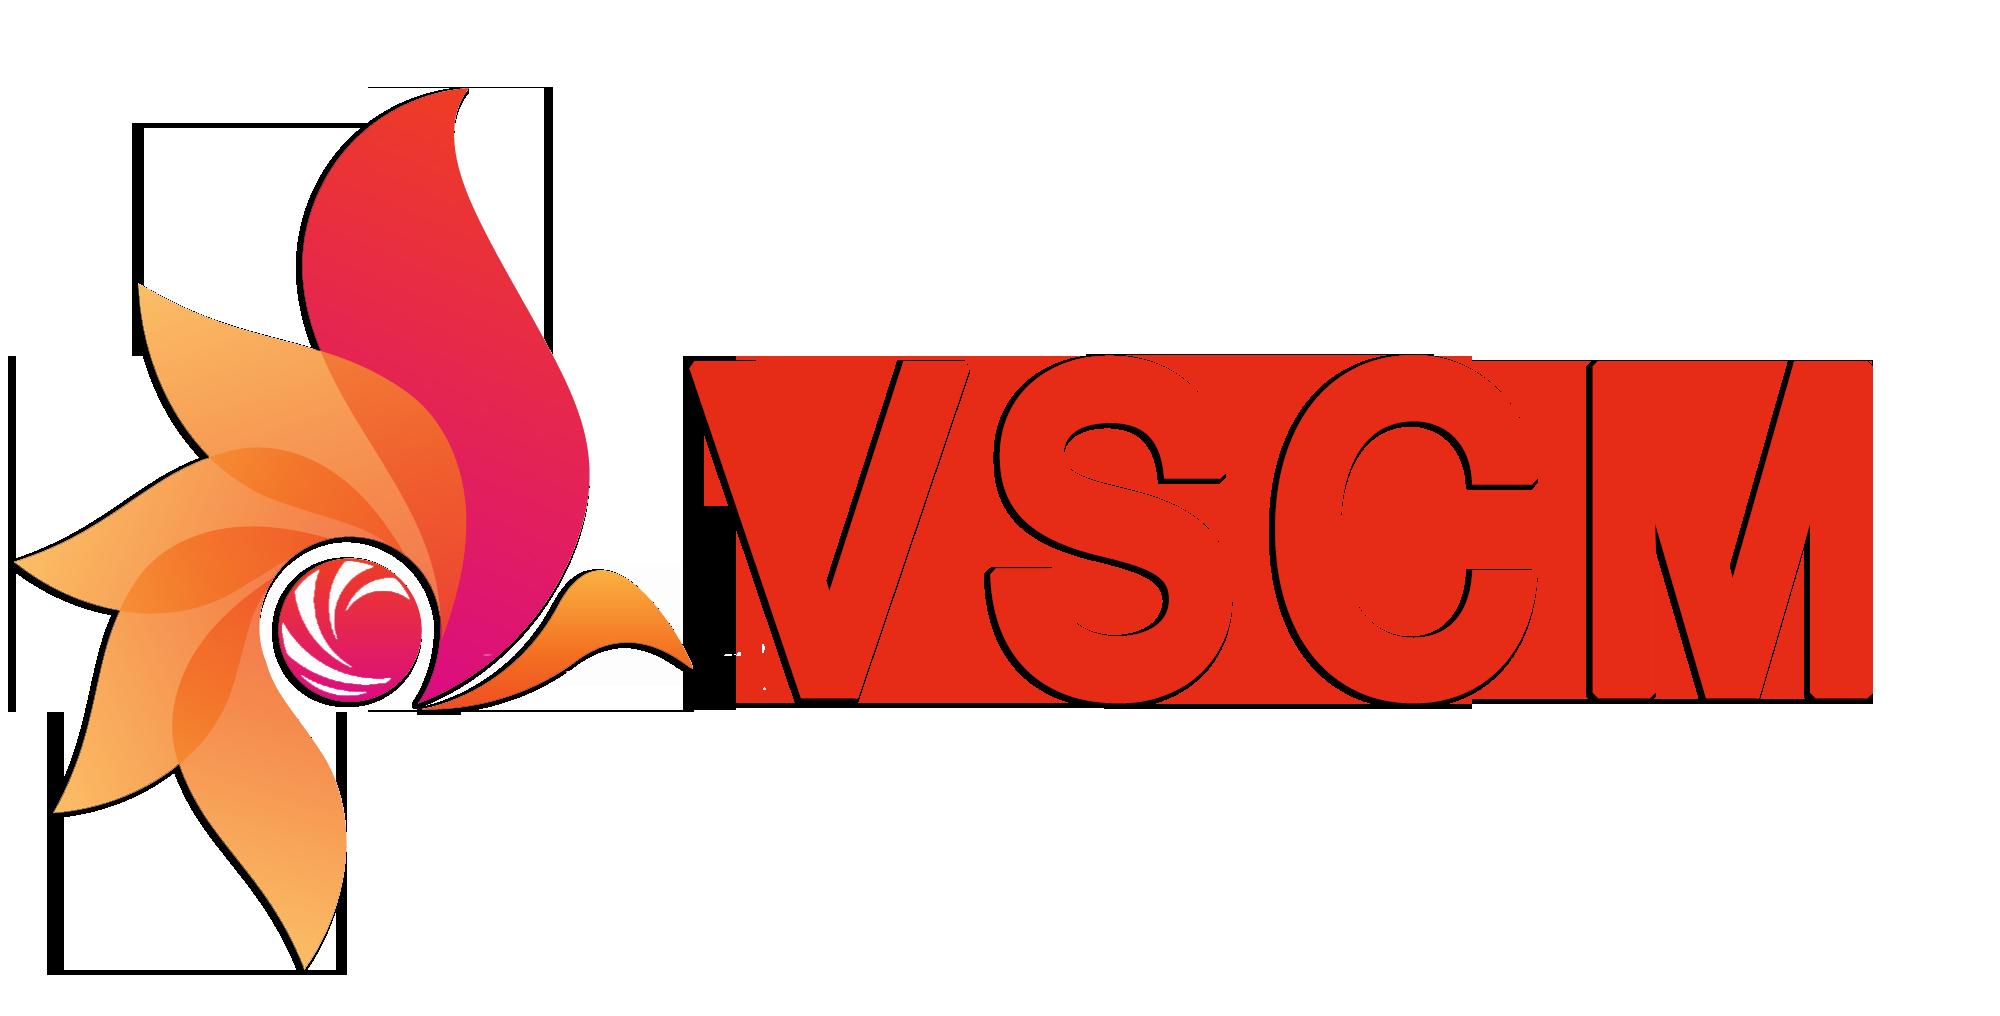 10TH INTERNATIONAL CONFERENCE ON VITAL ISSUES IN SOCIAL SCIENCES, COMMUNICATION AND MANAGEMENT RESEARCH(VSCM-December-2017) Etkinlik Afişi